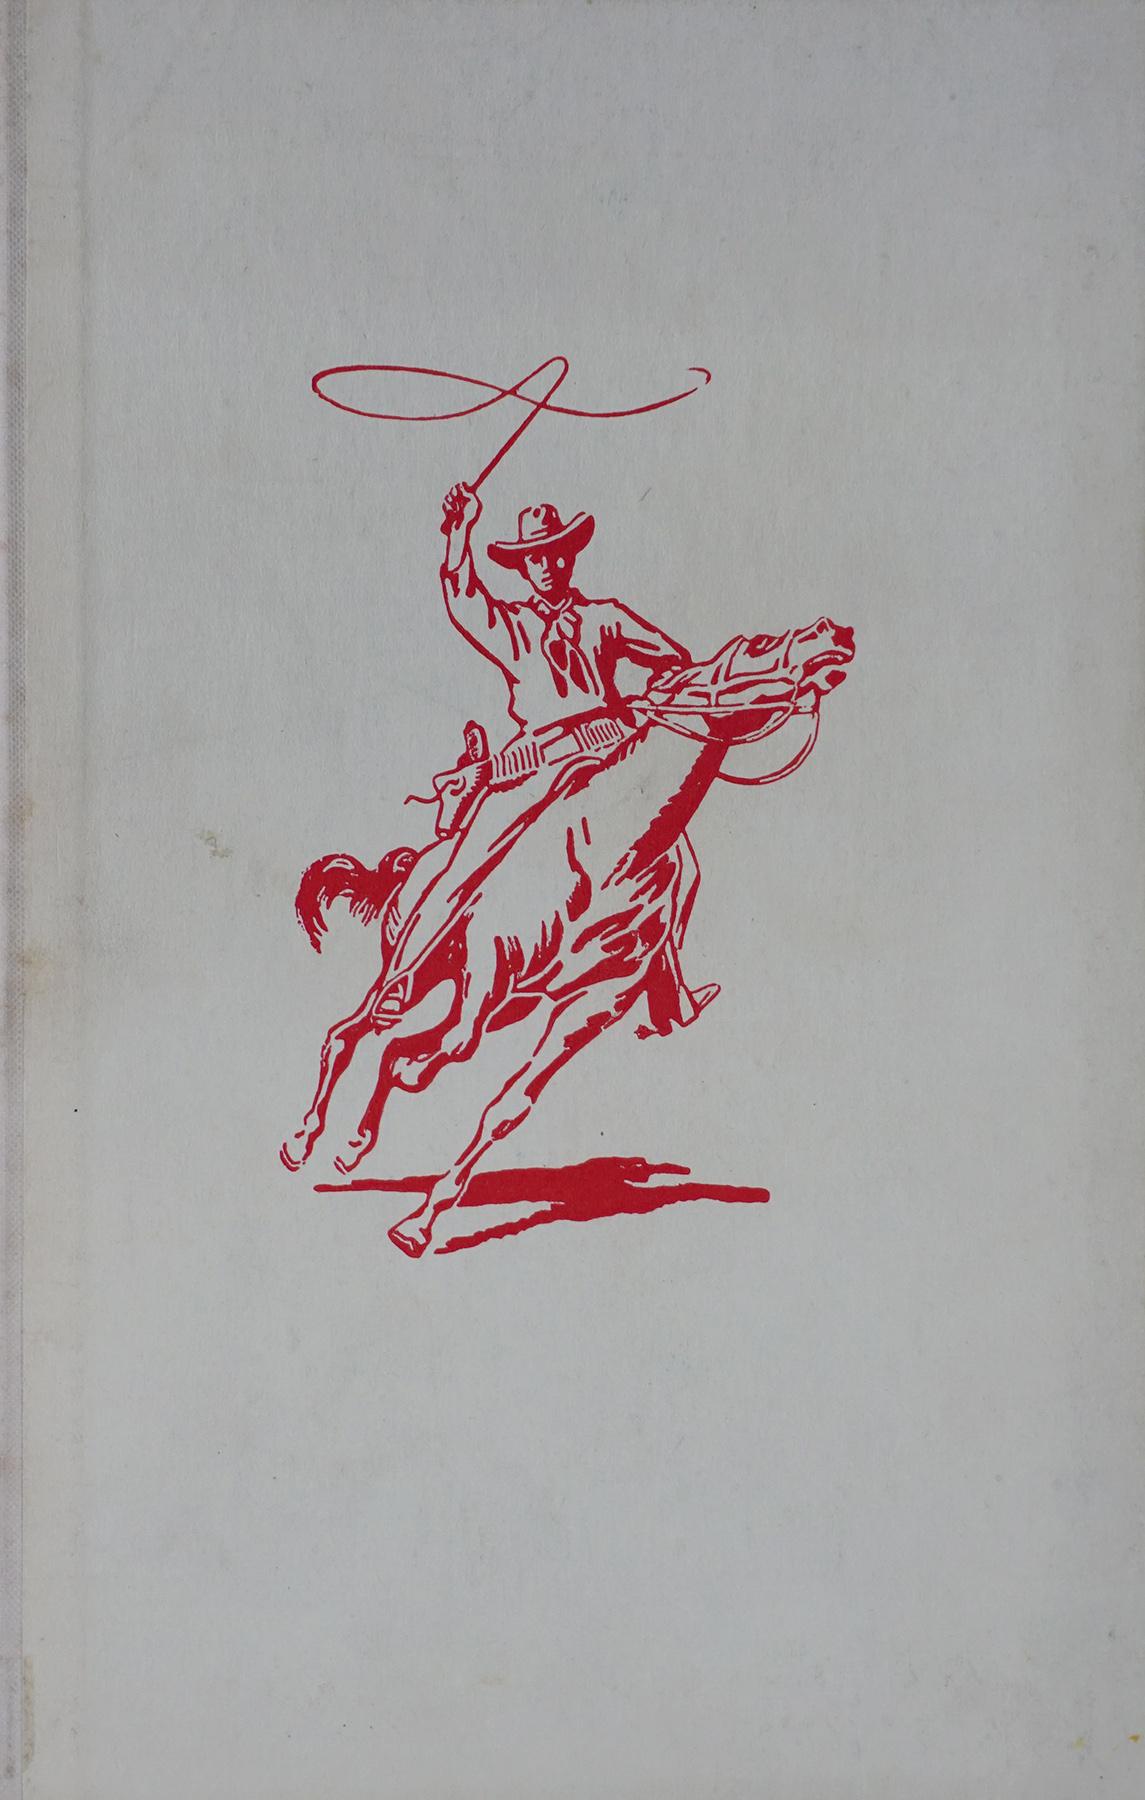 Copy of (Detail) Narrativas cíclicas, Assemblage with books + metallic table, 2017